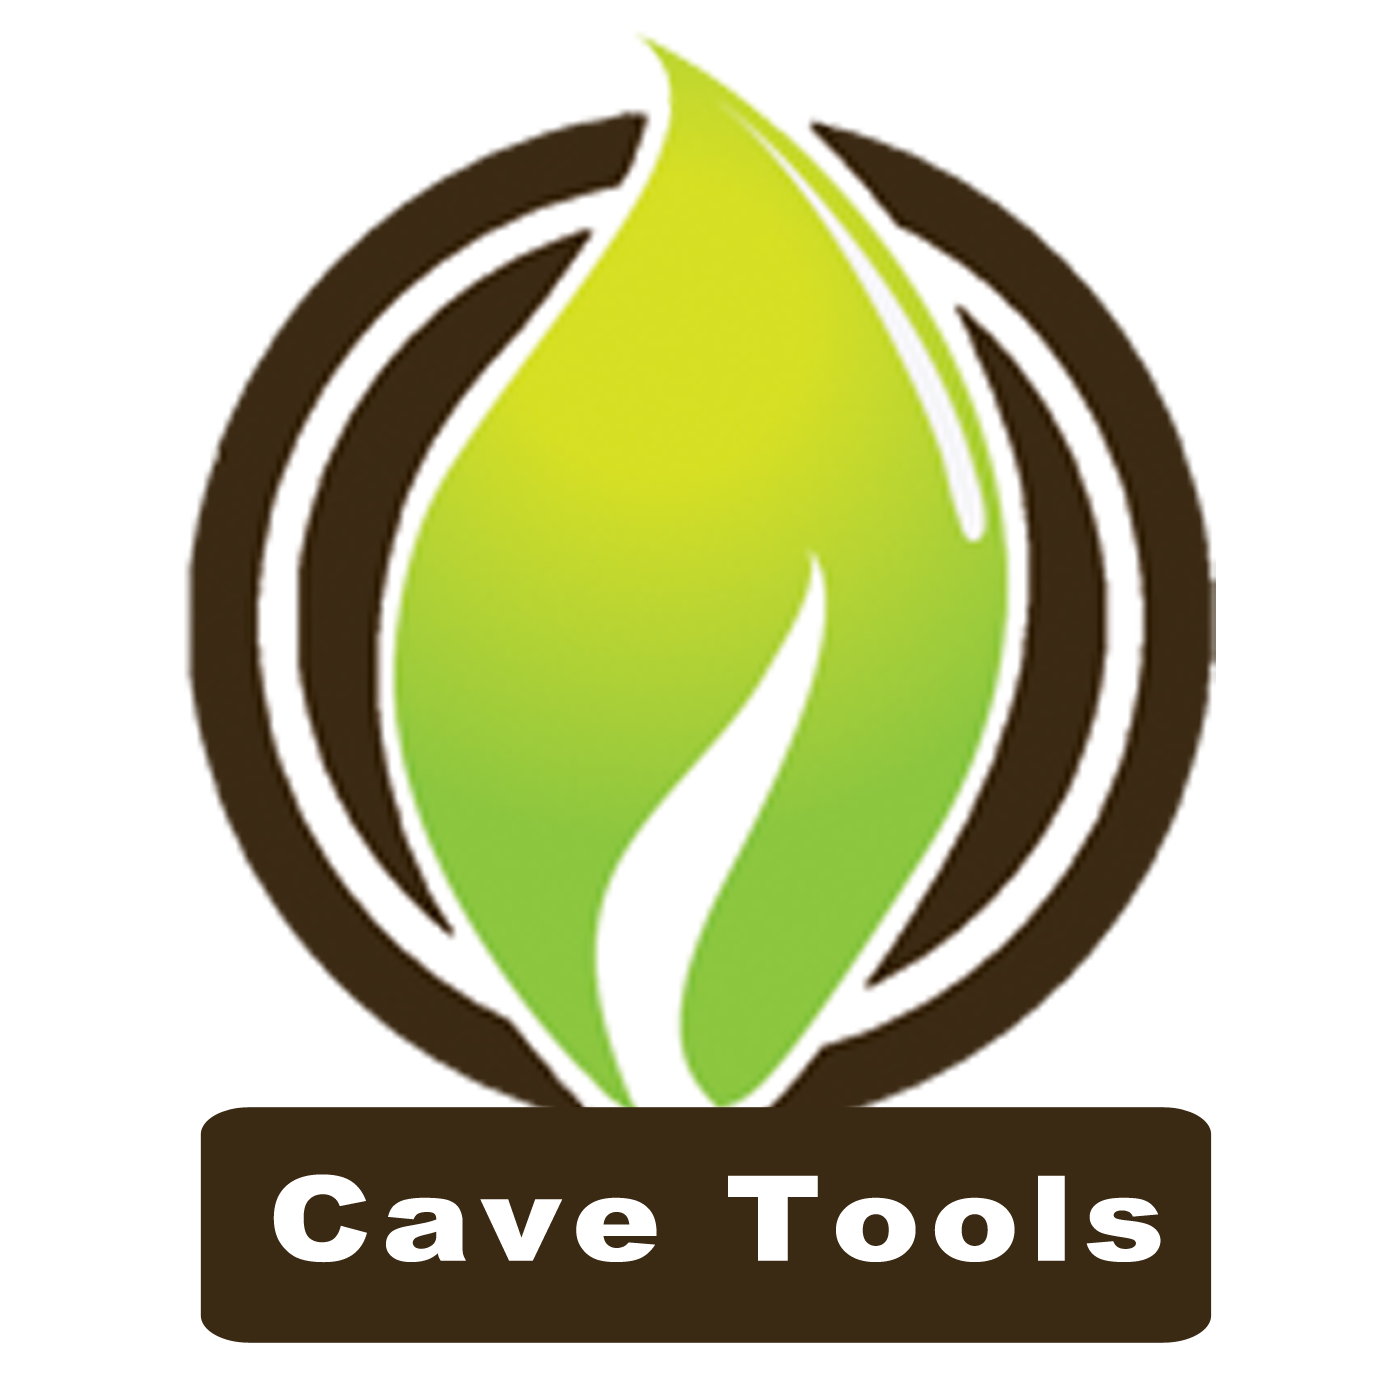 CaveTools